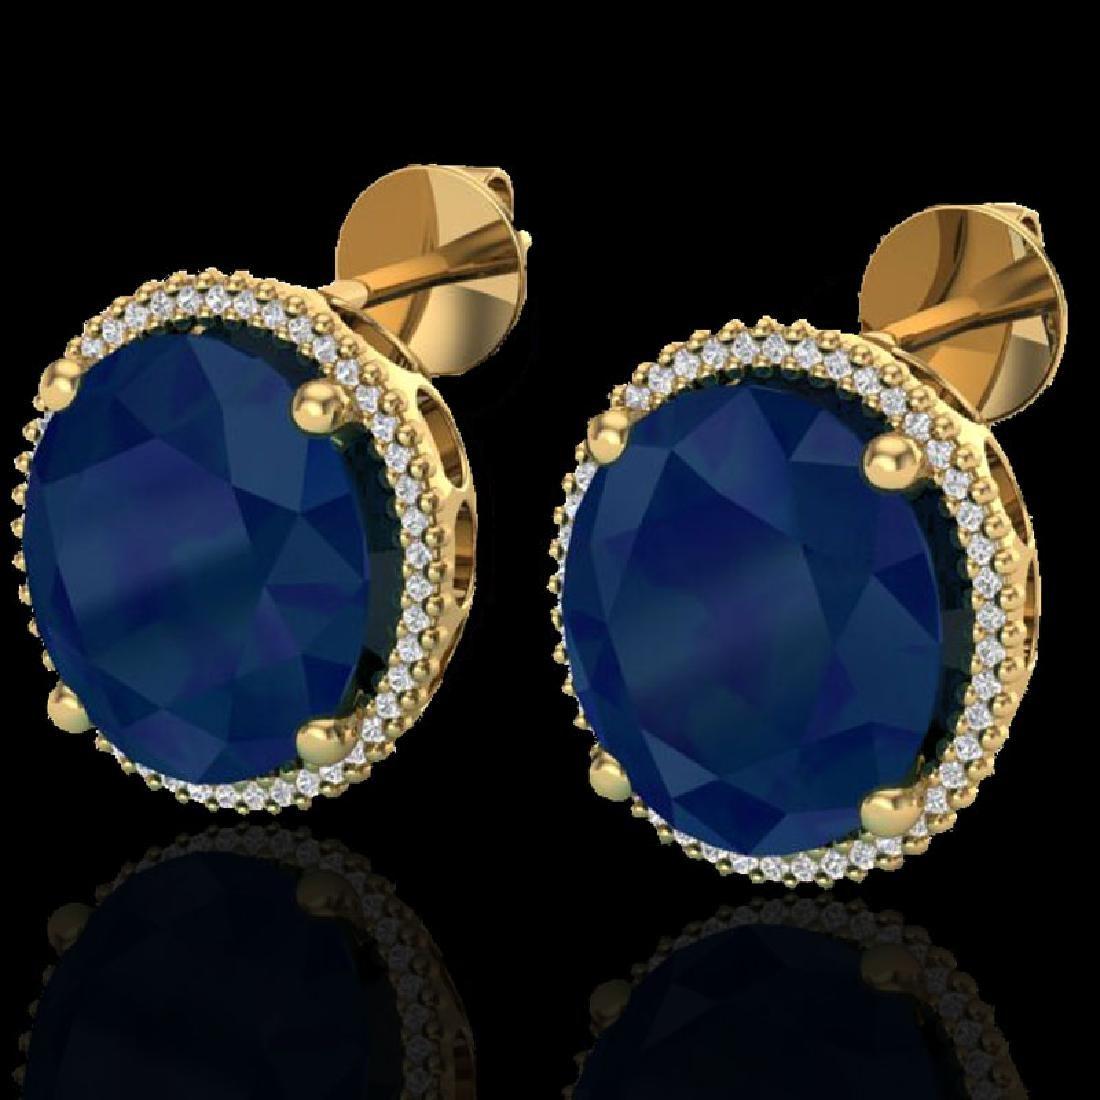 25 CTW Sapphire & Micro Pave VS/SI Diamond Halo